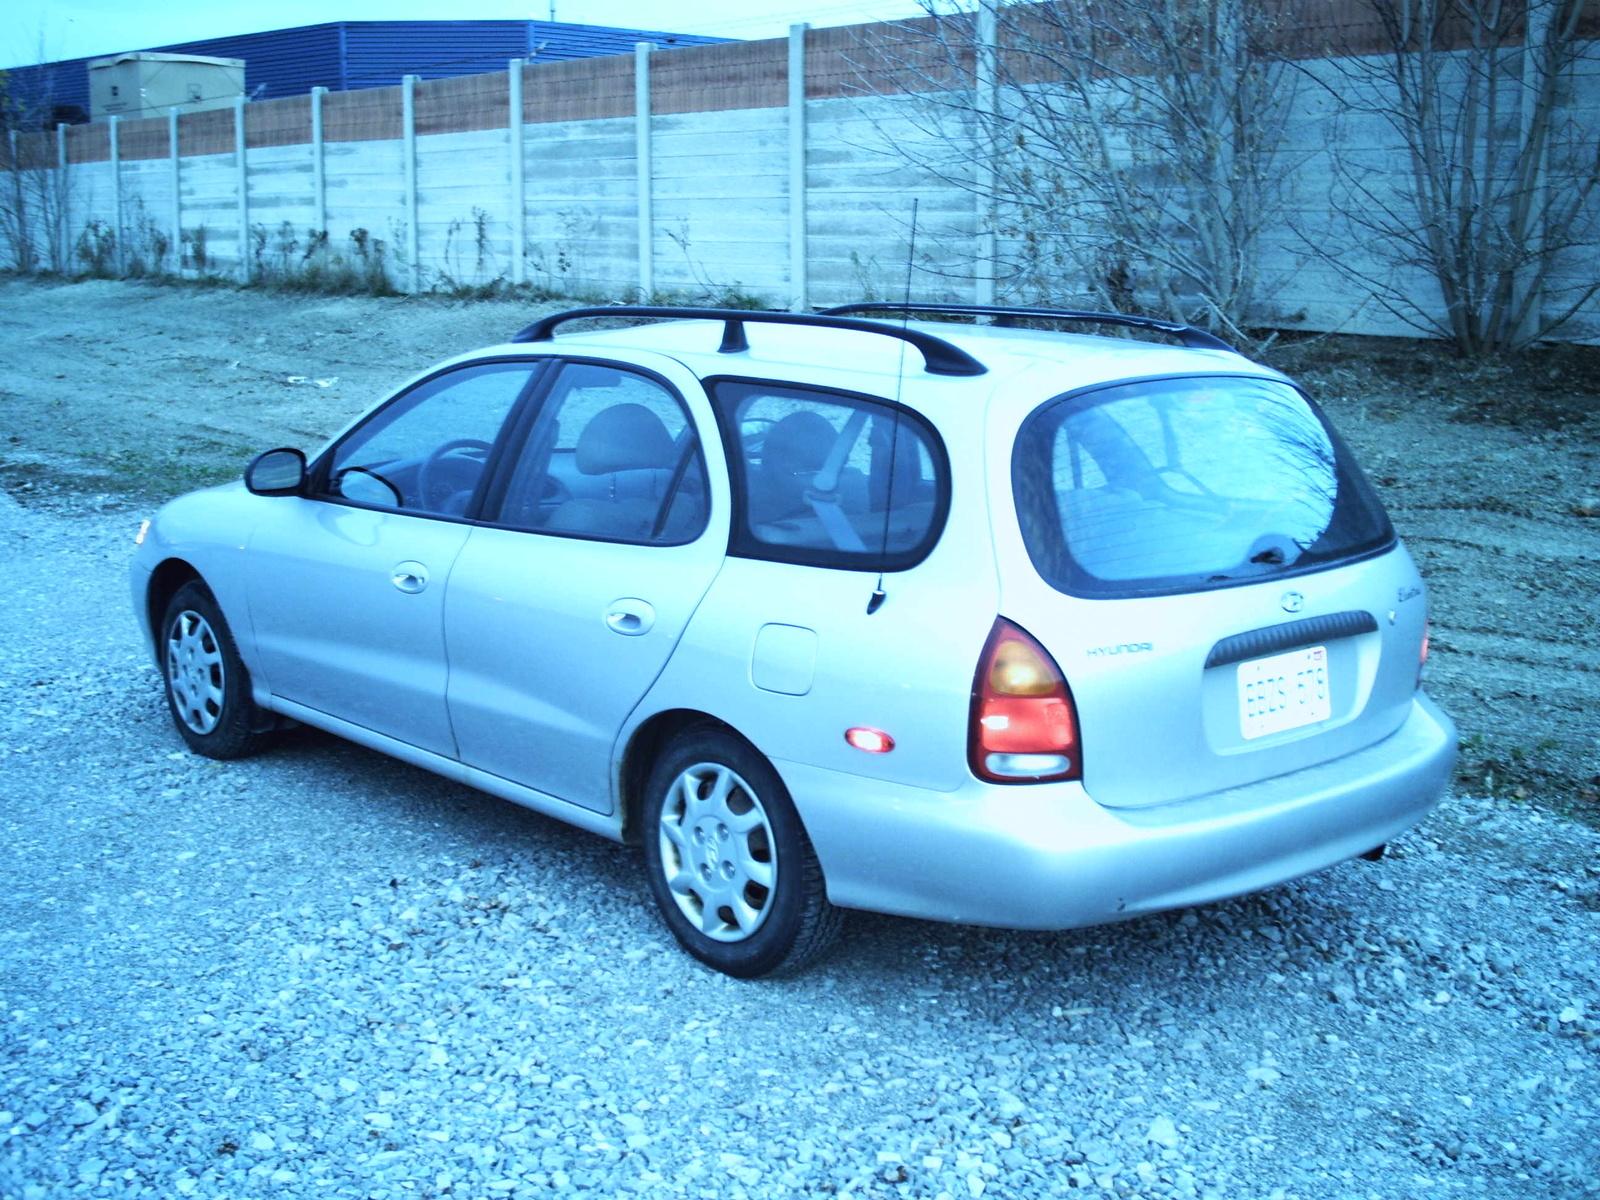 Hyundai Elantra Dr Std Wagon Pic on 1992 Hyundai Scoupe